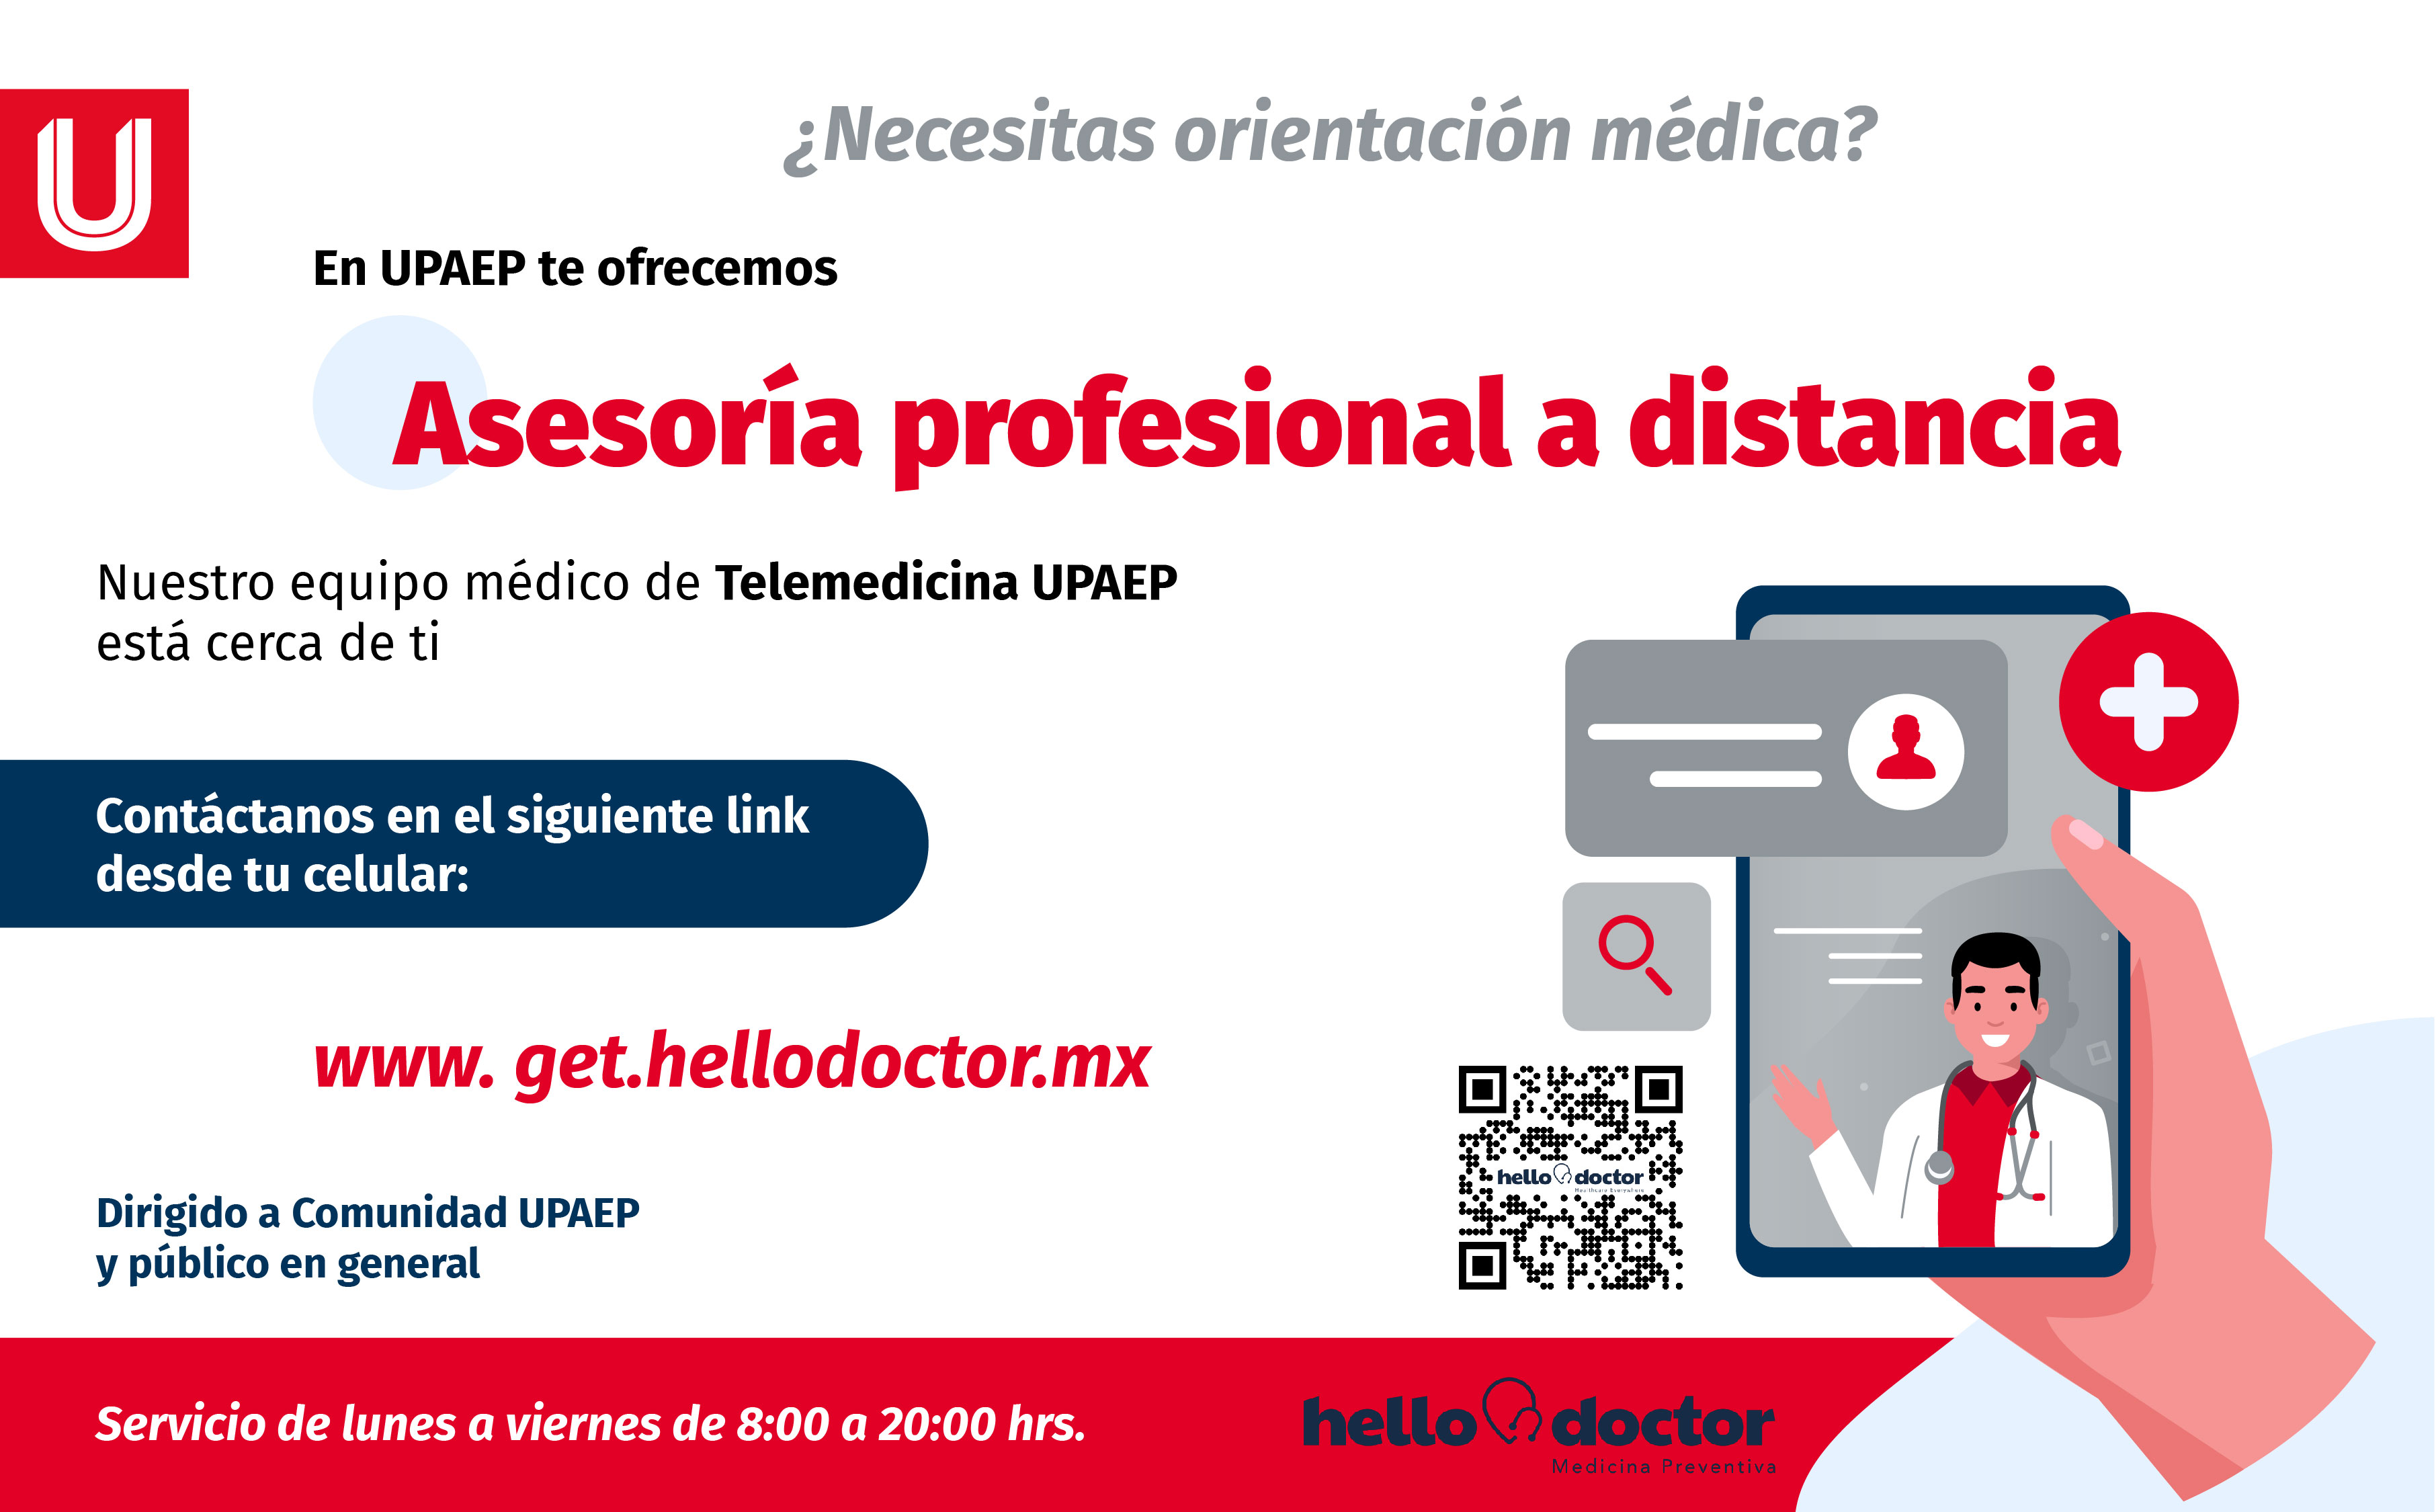 TelemedicinaUPAEP-03